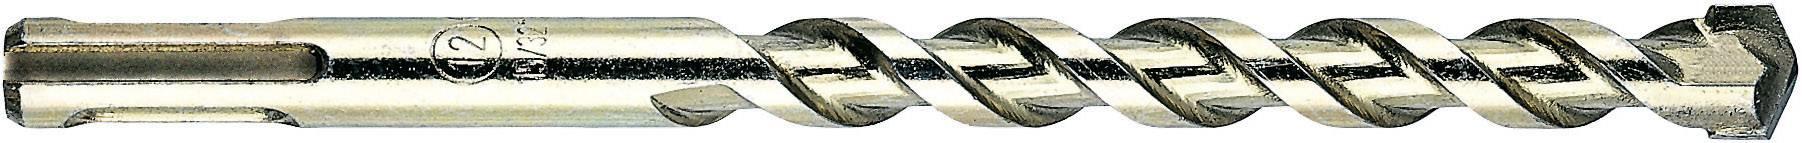 Vrták Heller Allmat SDS-plus, 6 x 160 mm